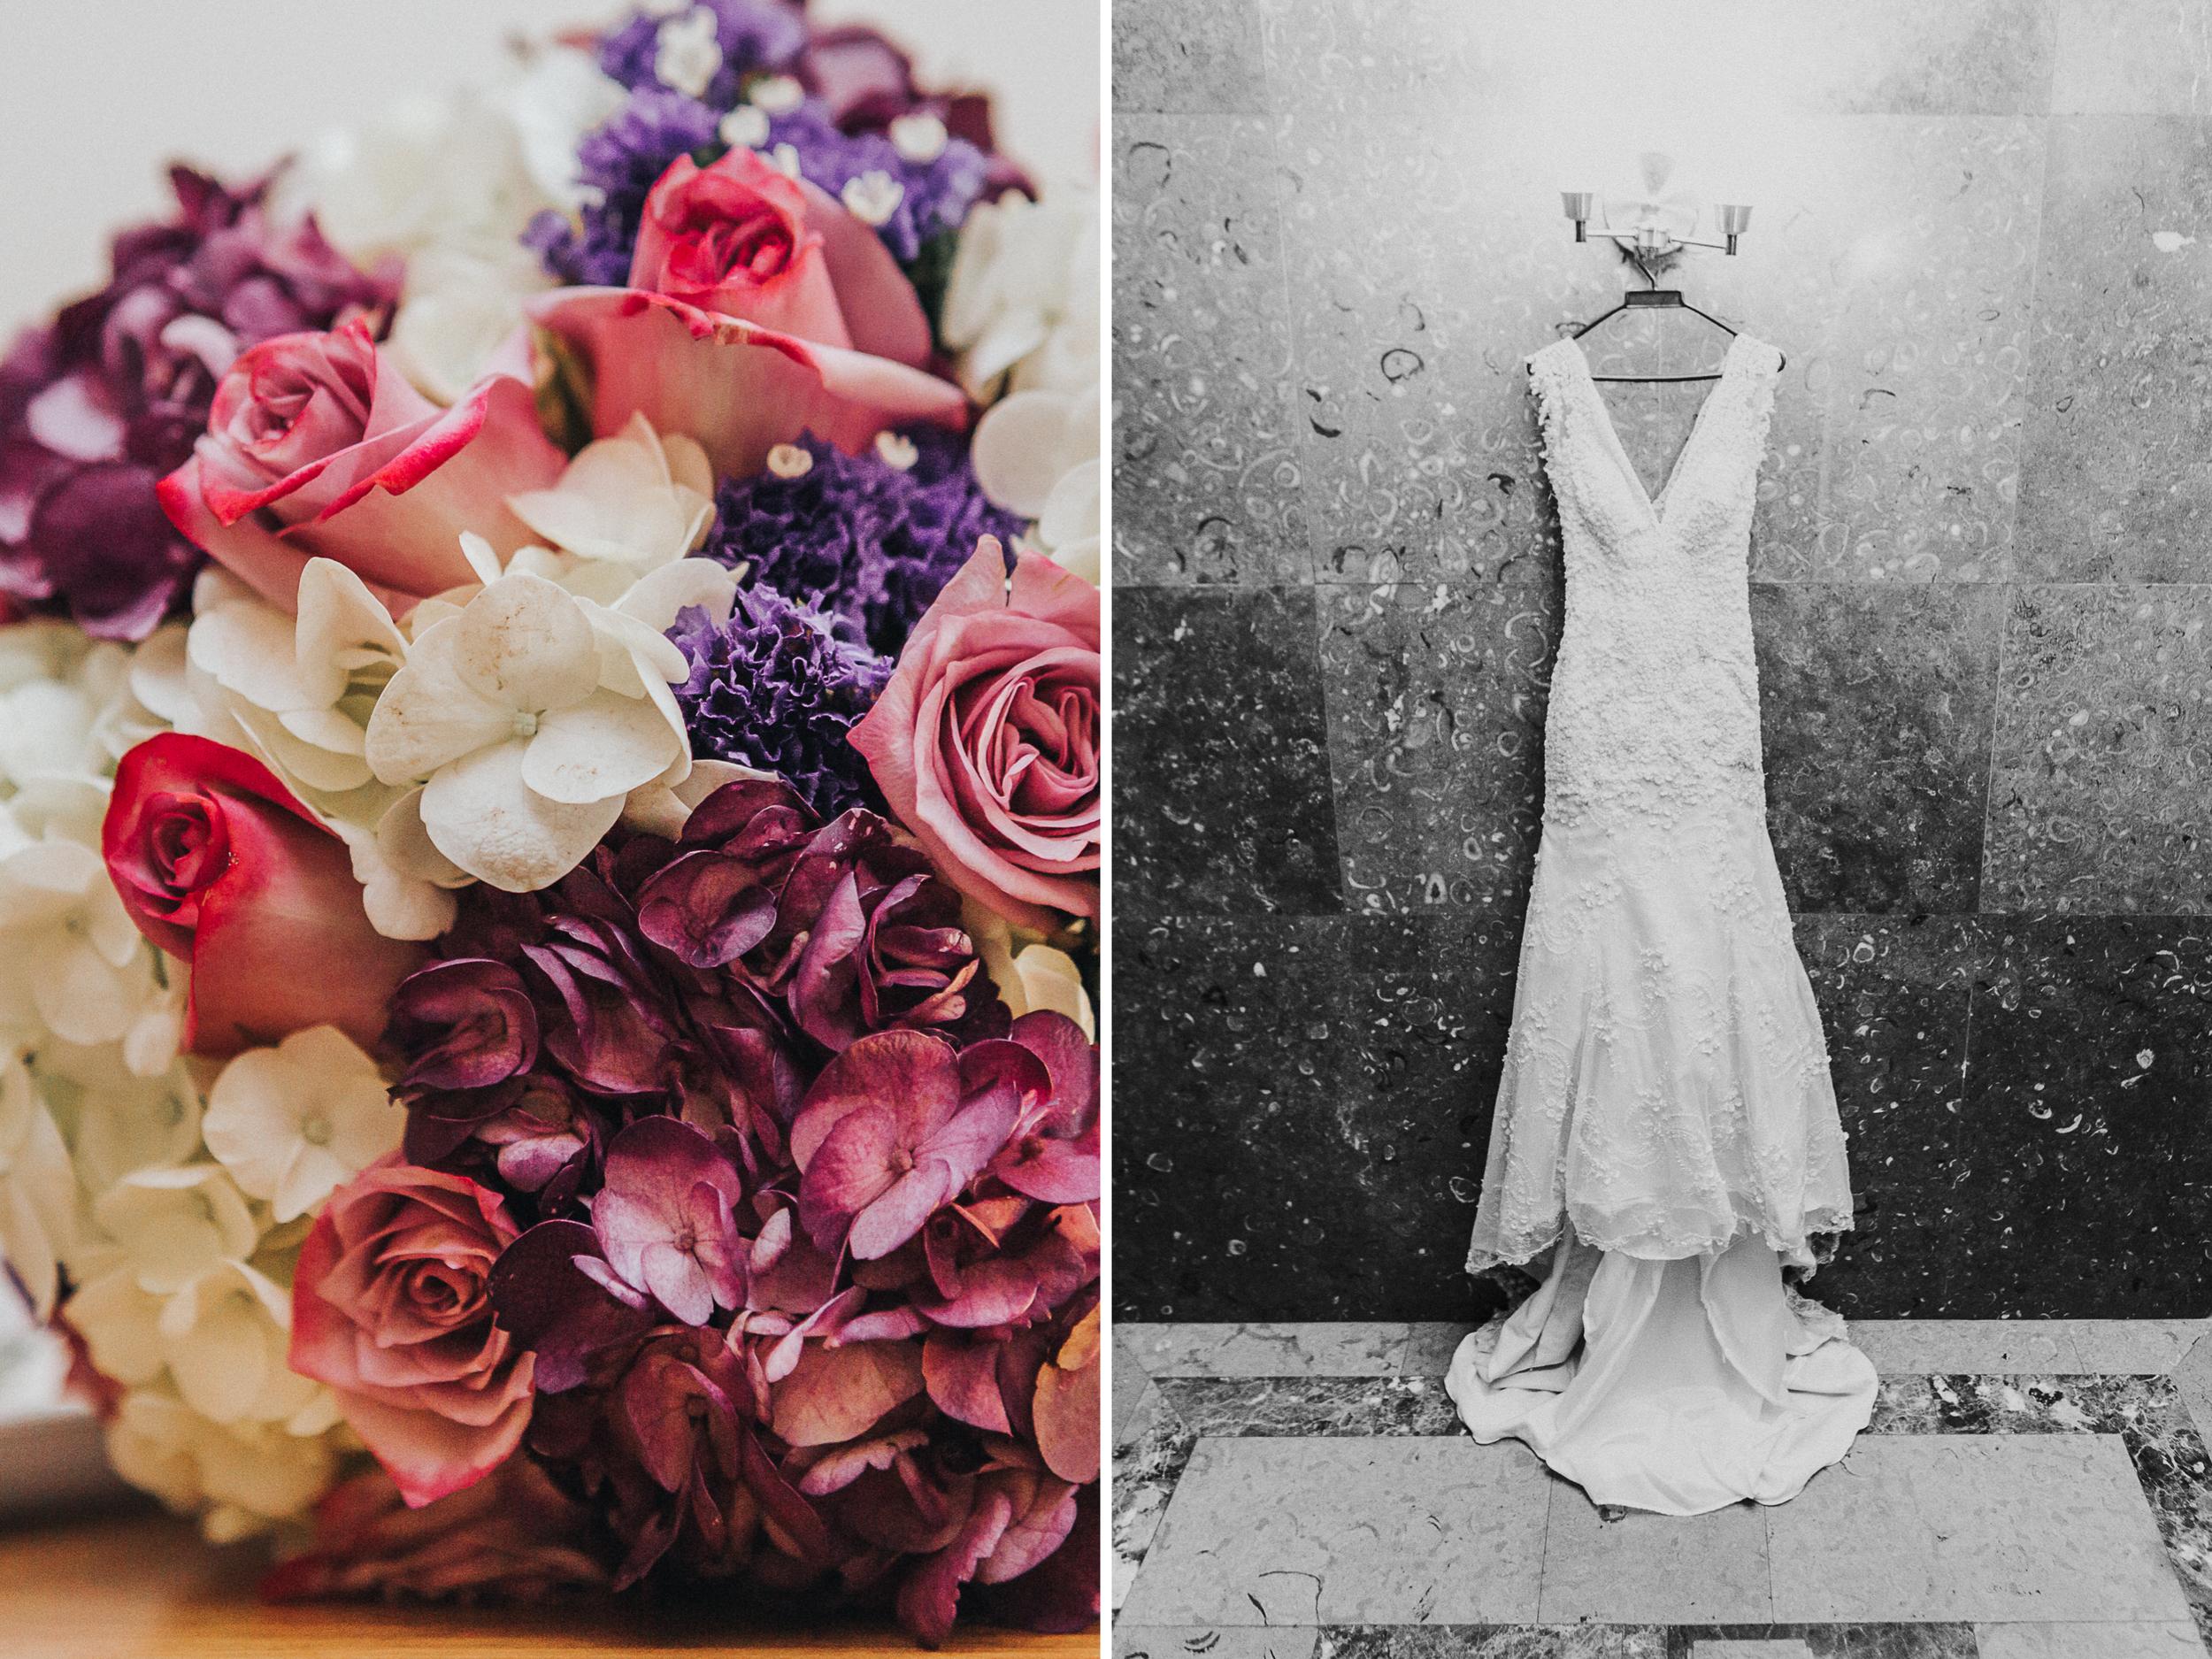 orlando-destination-wedding-photographer-bride-dress-bouquet-roses-hydrangea-purple-1.jpg